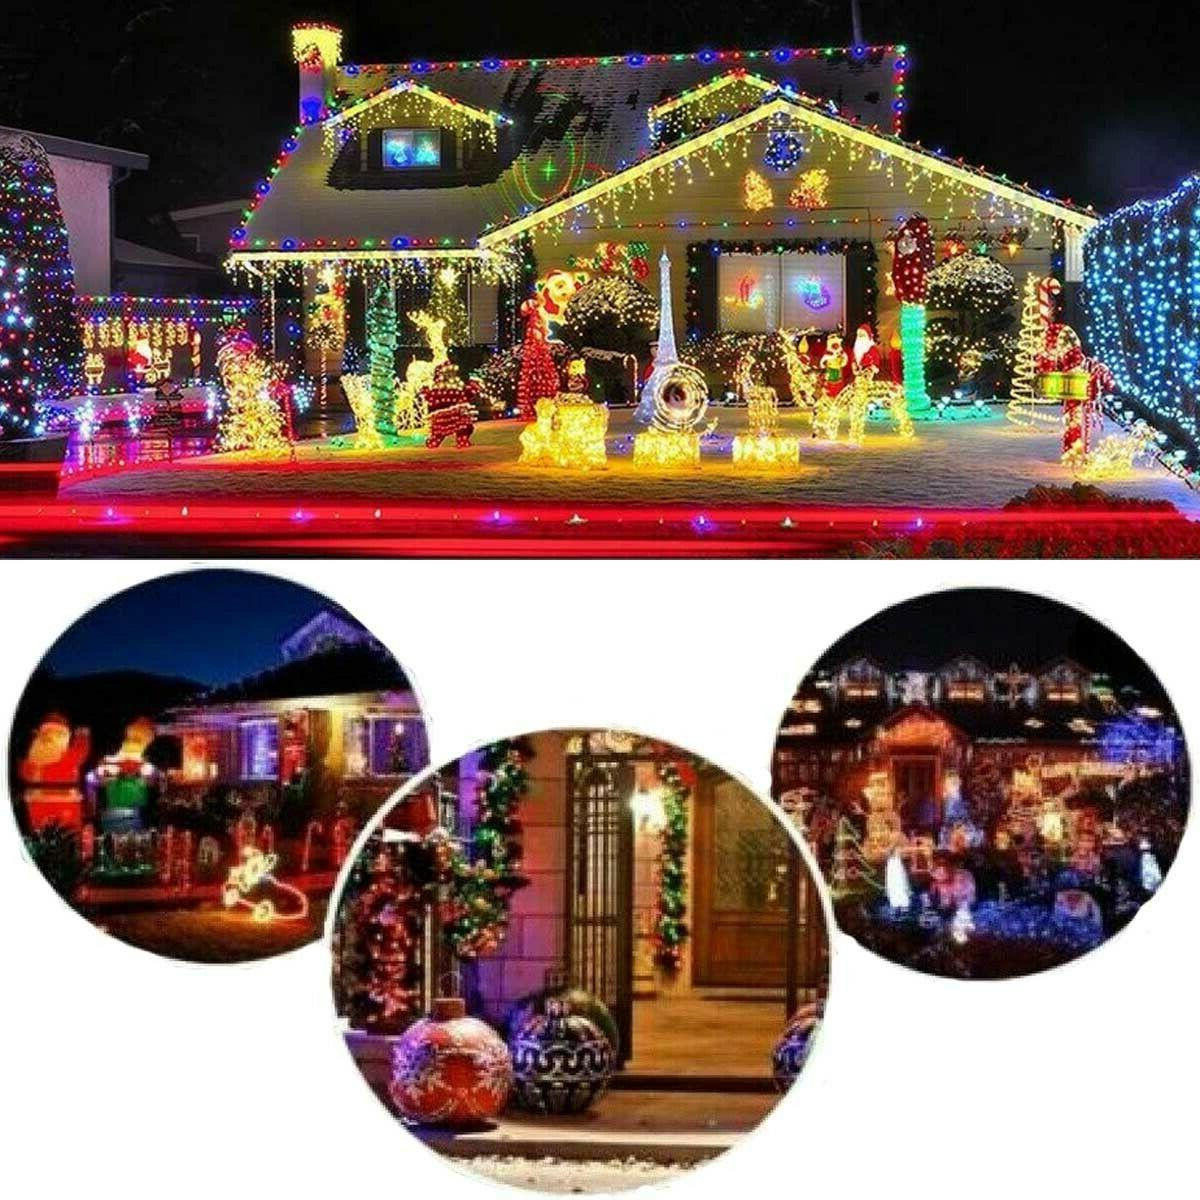 100 LED String Lights Garden Party Xmas